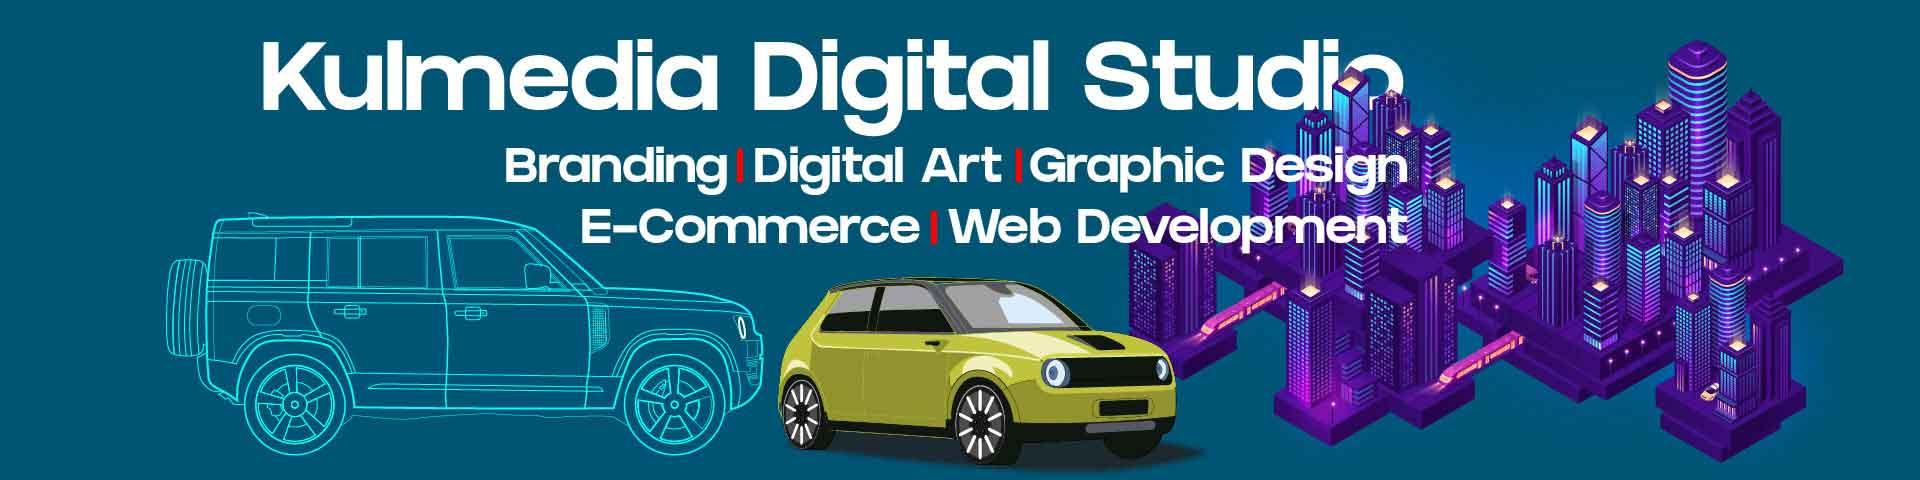 Kulmedia Digital Studio